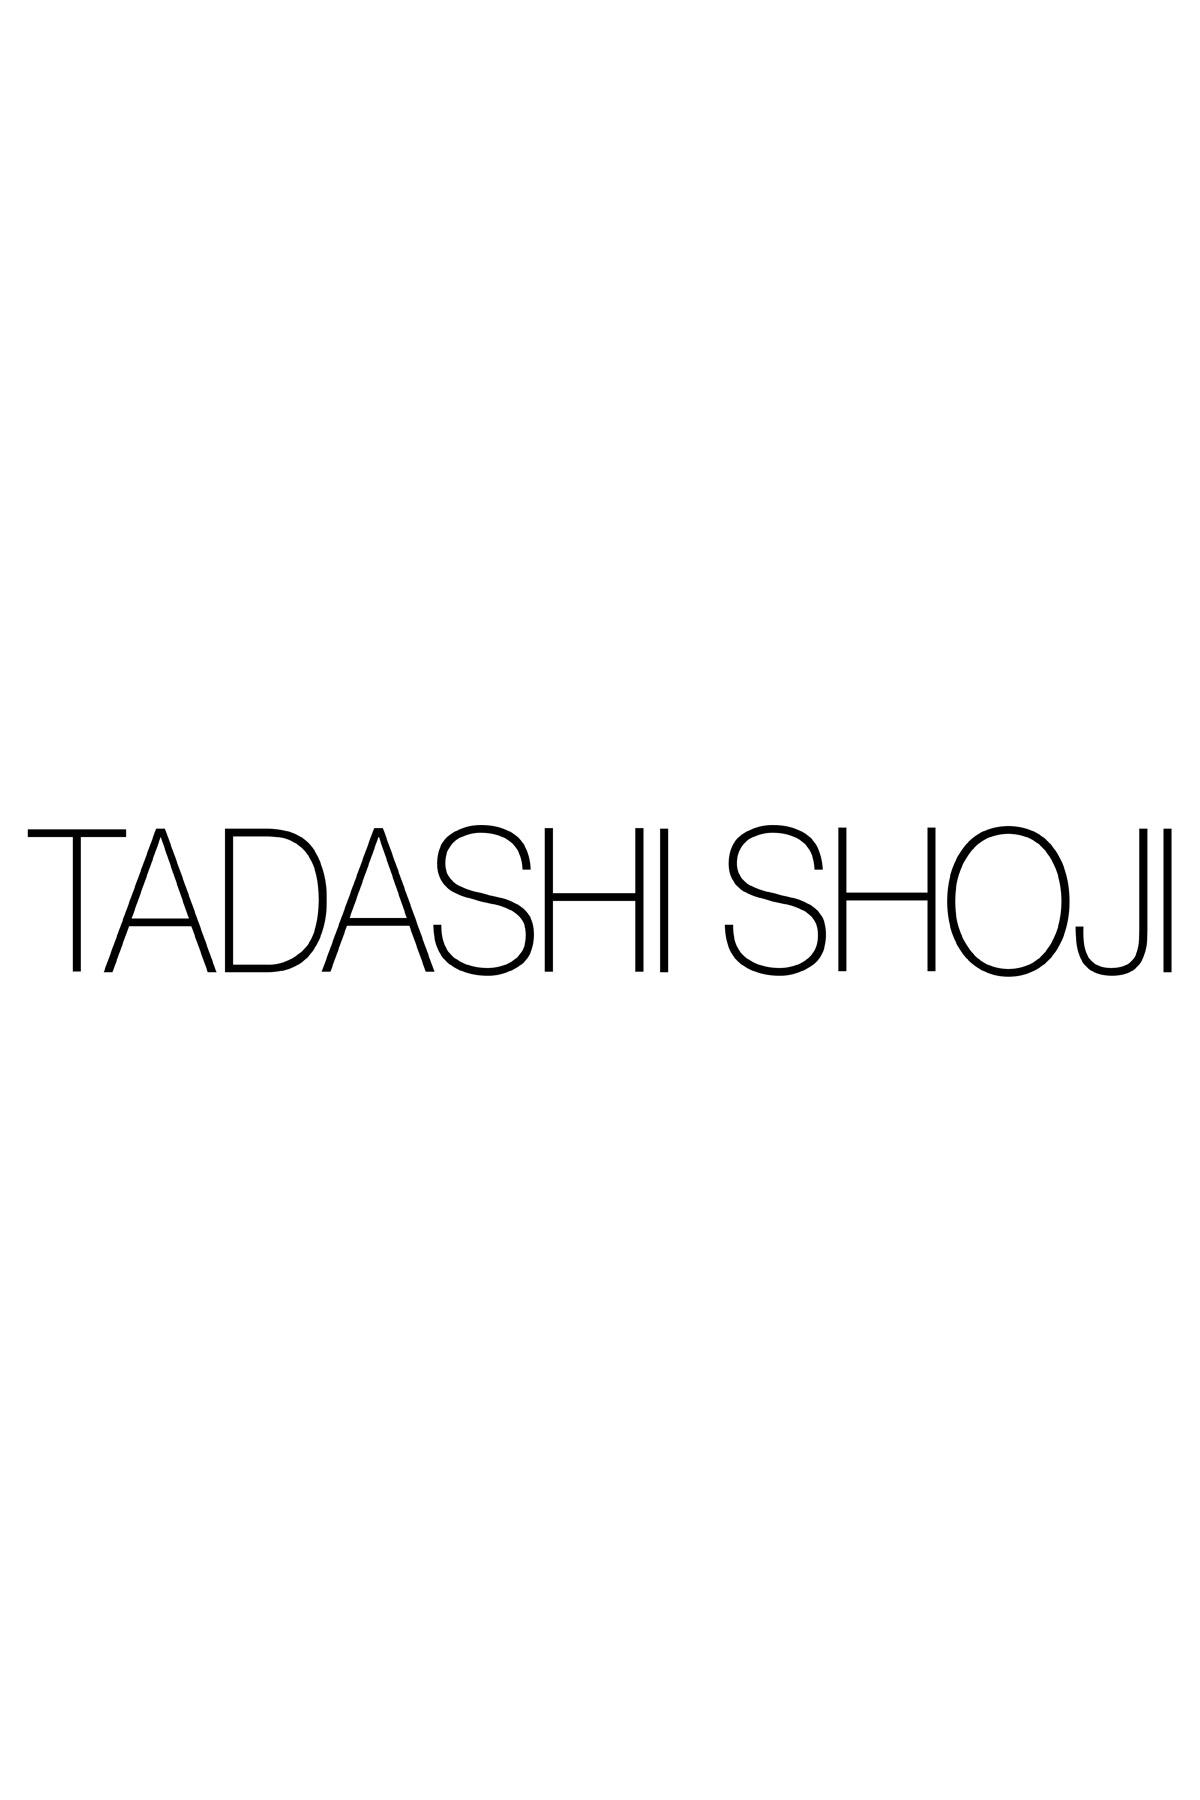 Stretch Satin Pencil Skirt in Black | Tadashi Shoji